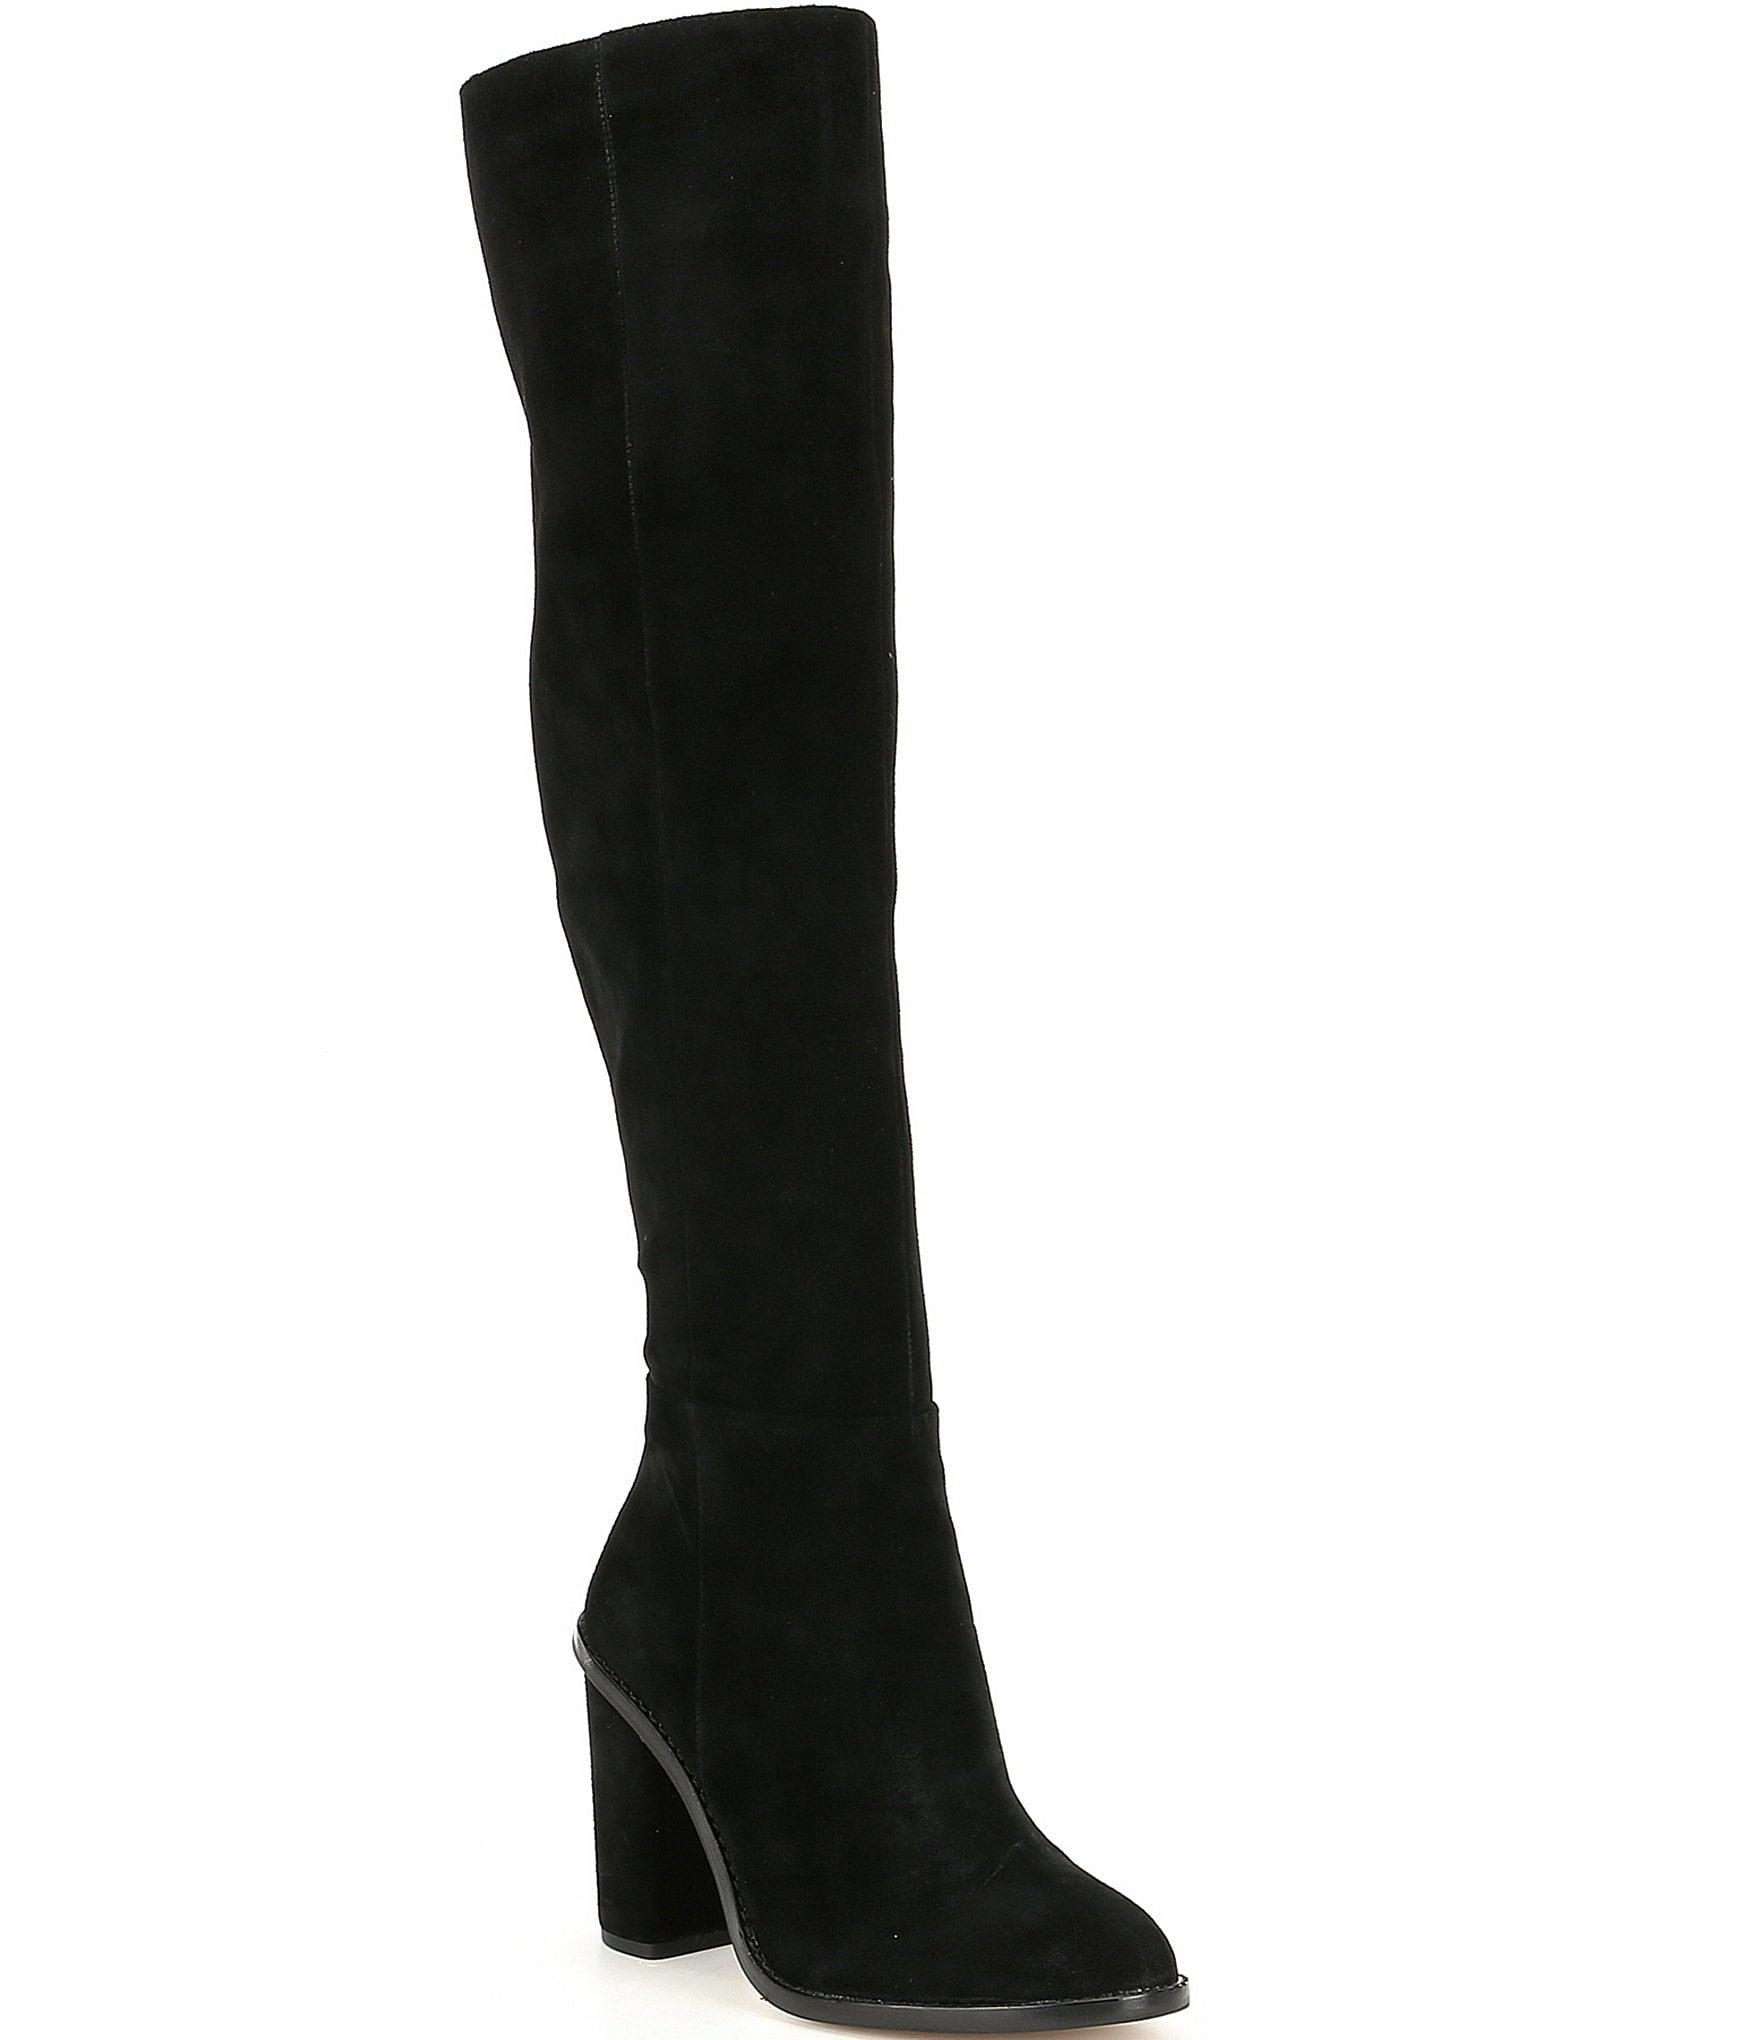 Women's Over the Knee Boots | Dillard's